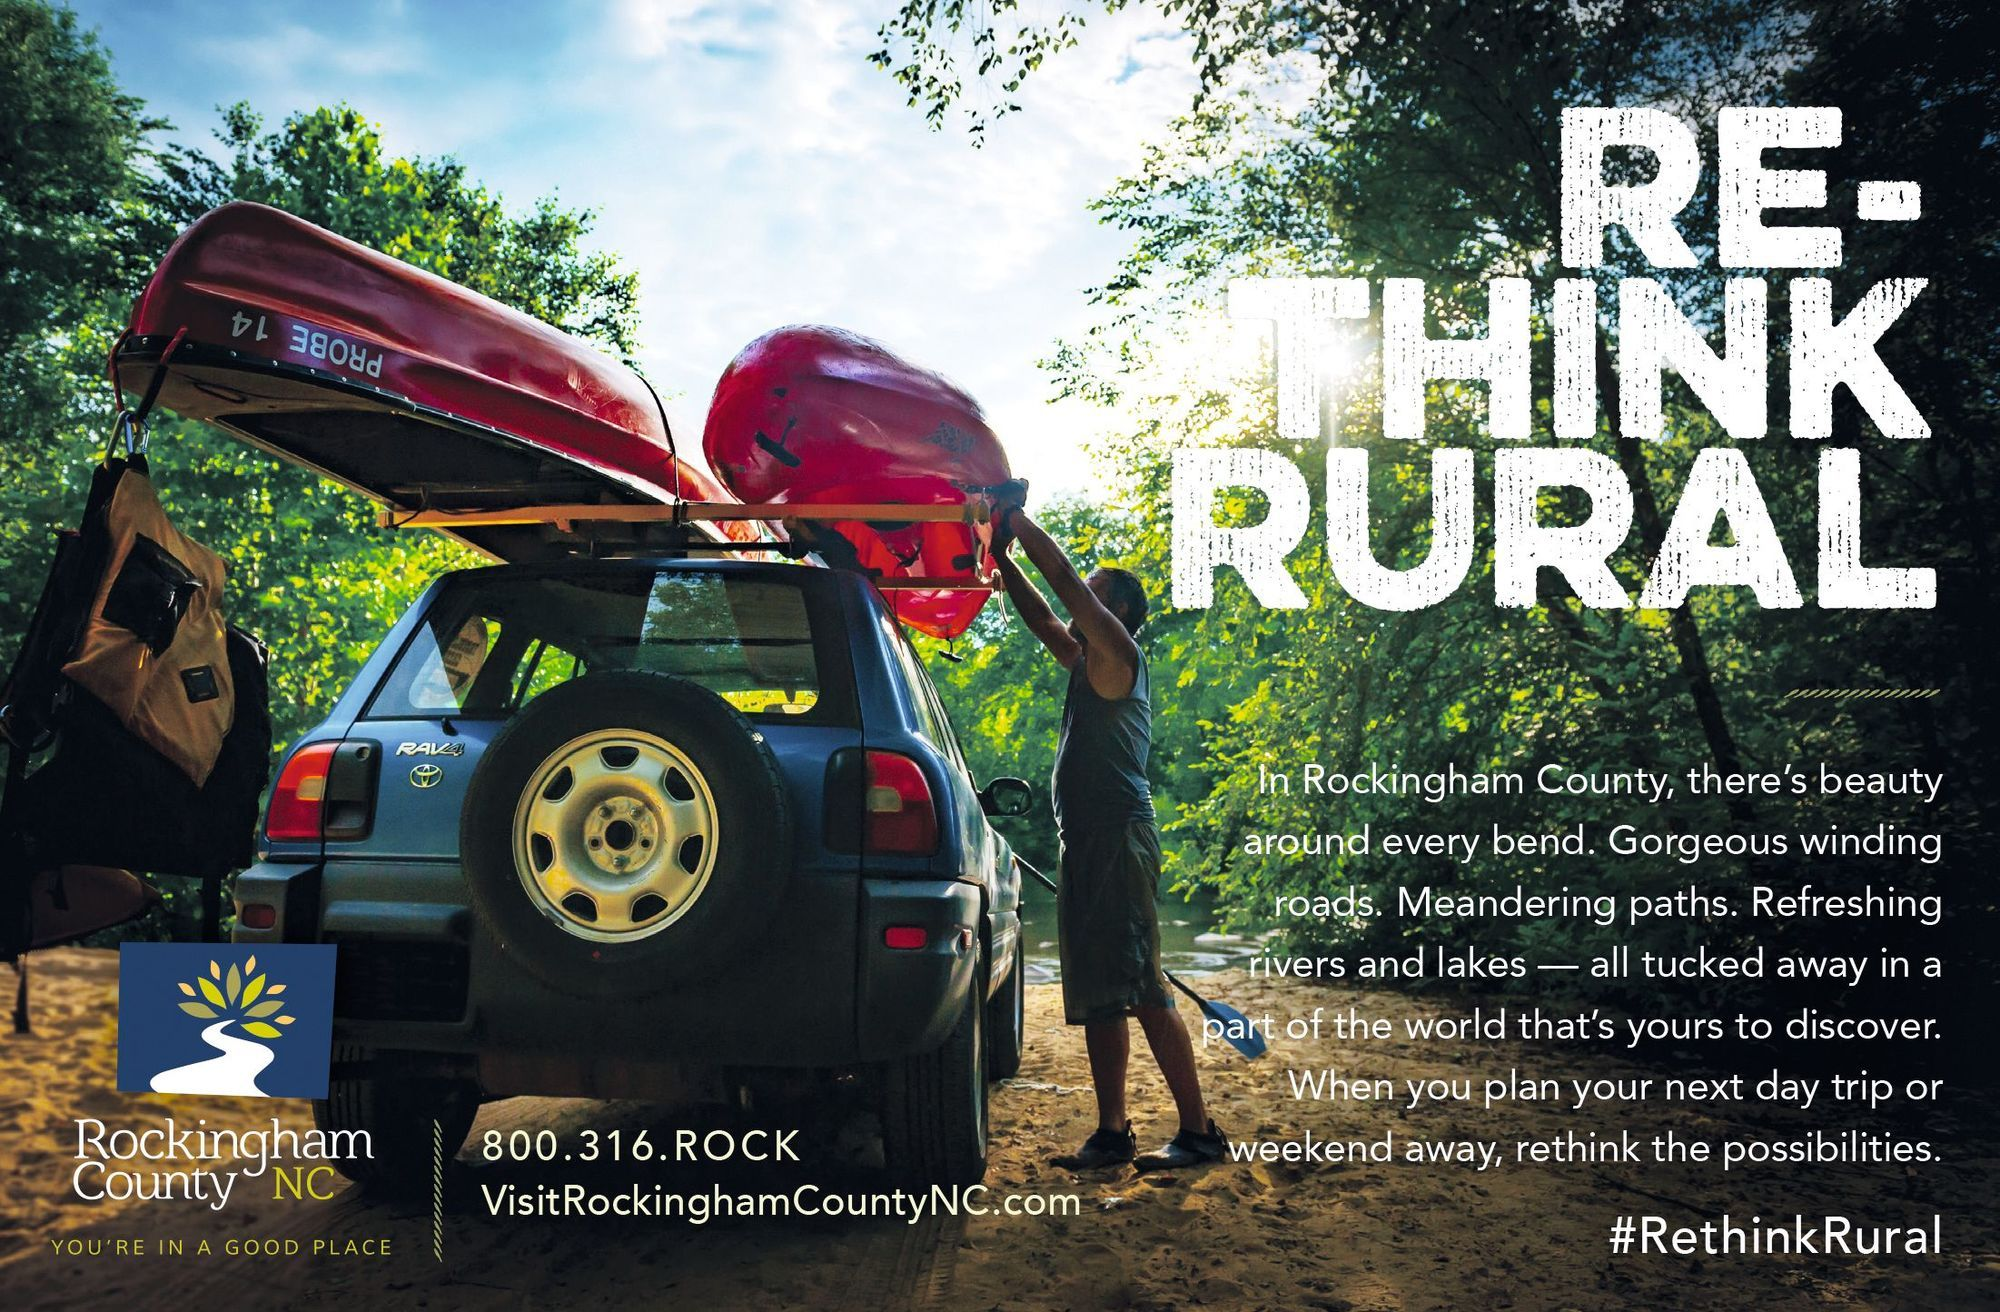 Re-think rural